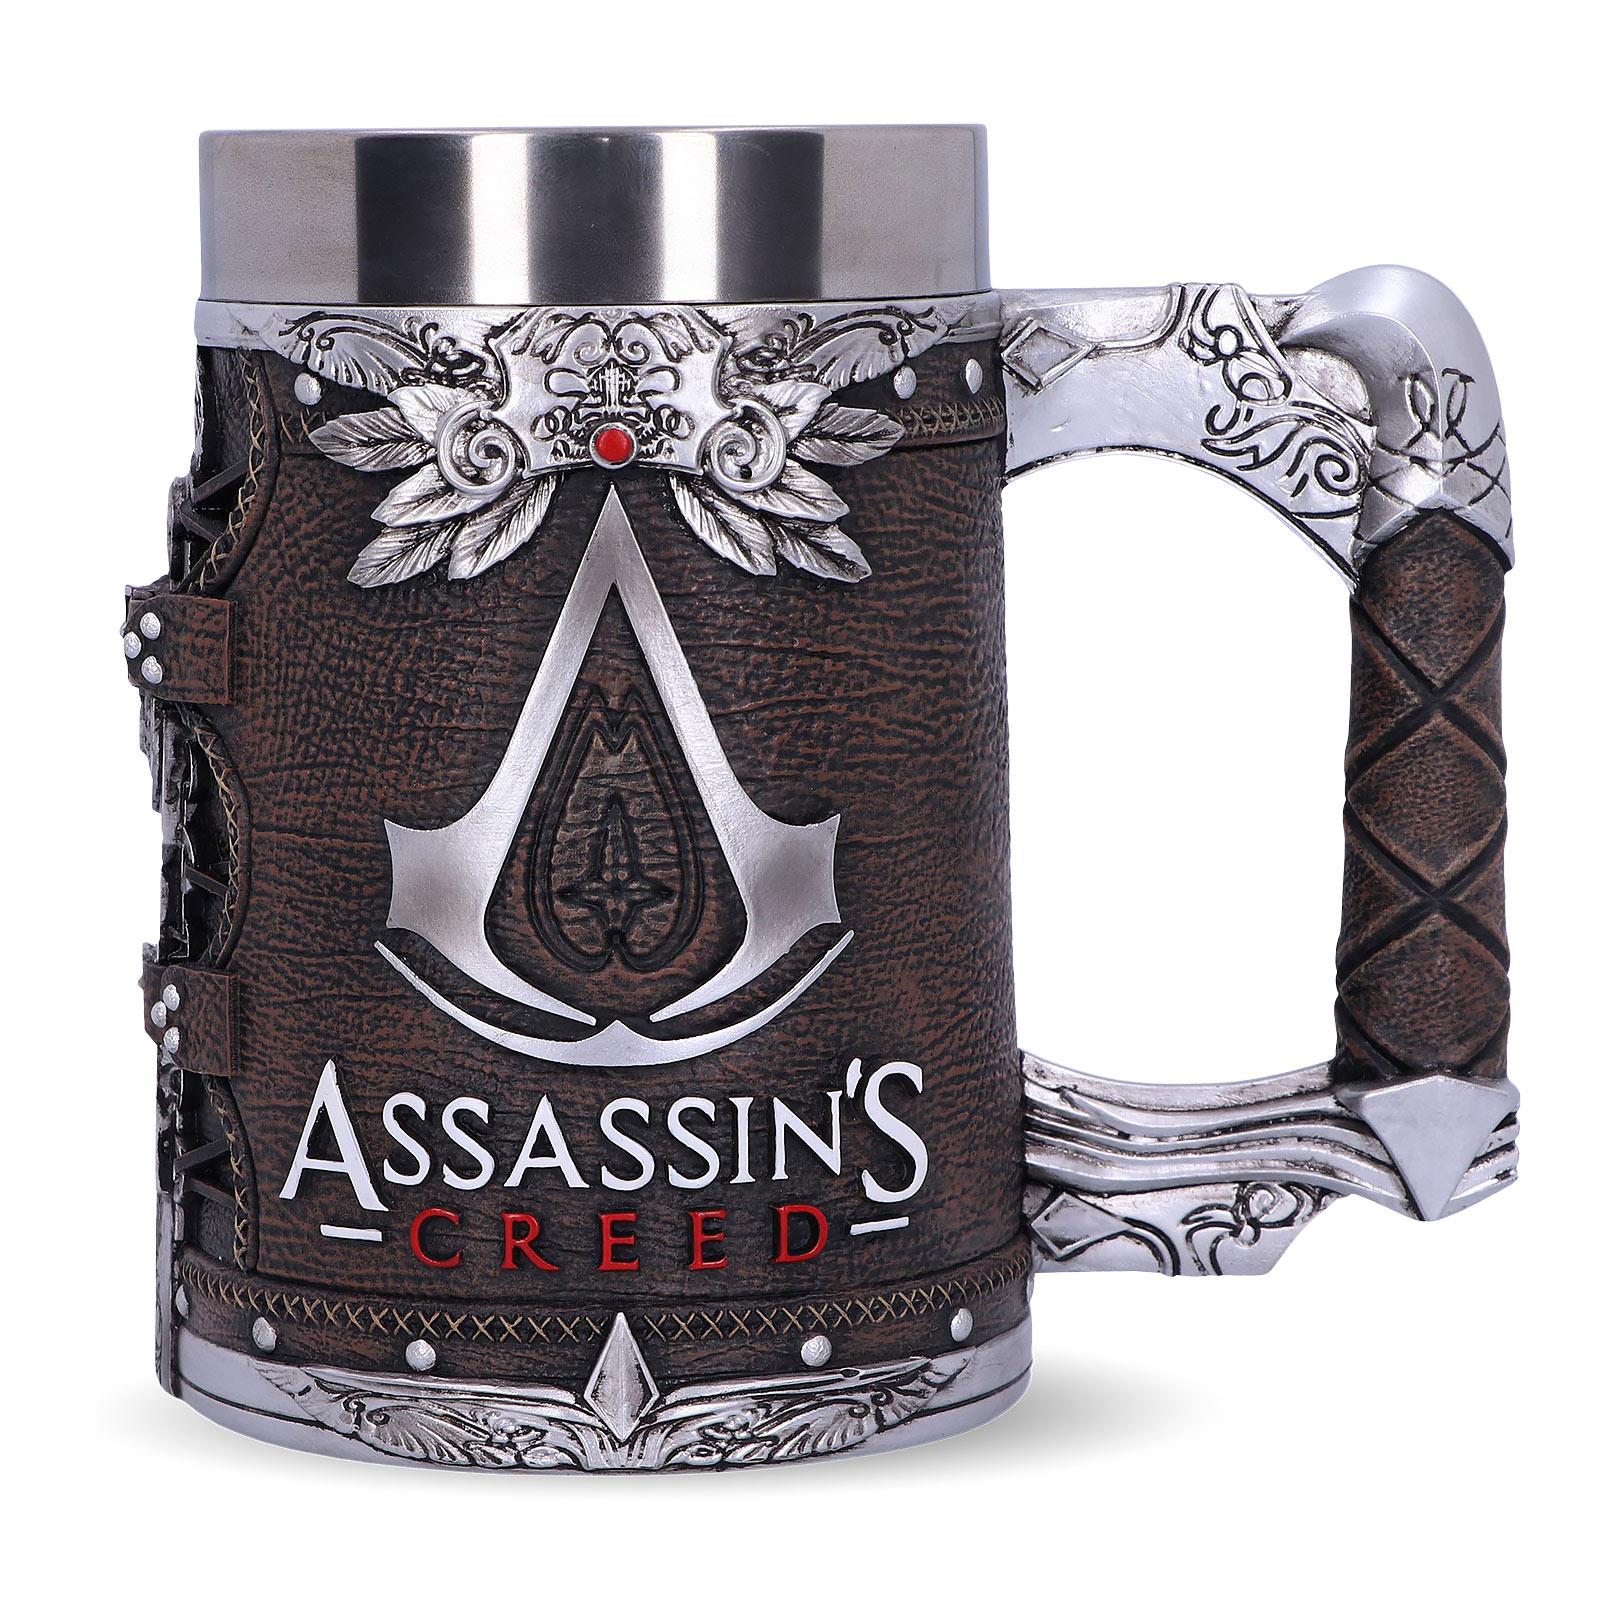 Assassin's Creed - Logo Krug deluxe braun